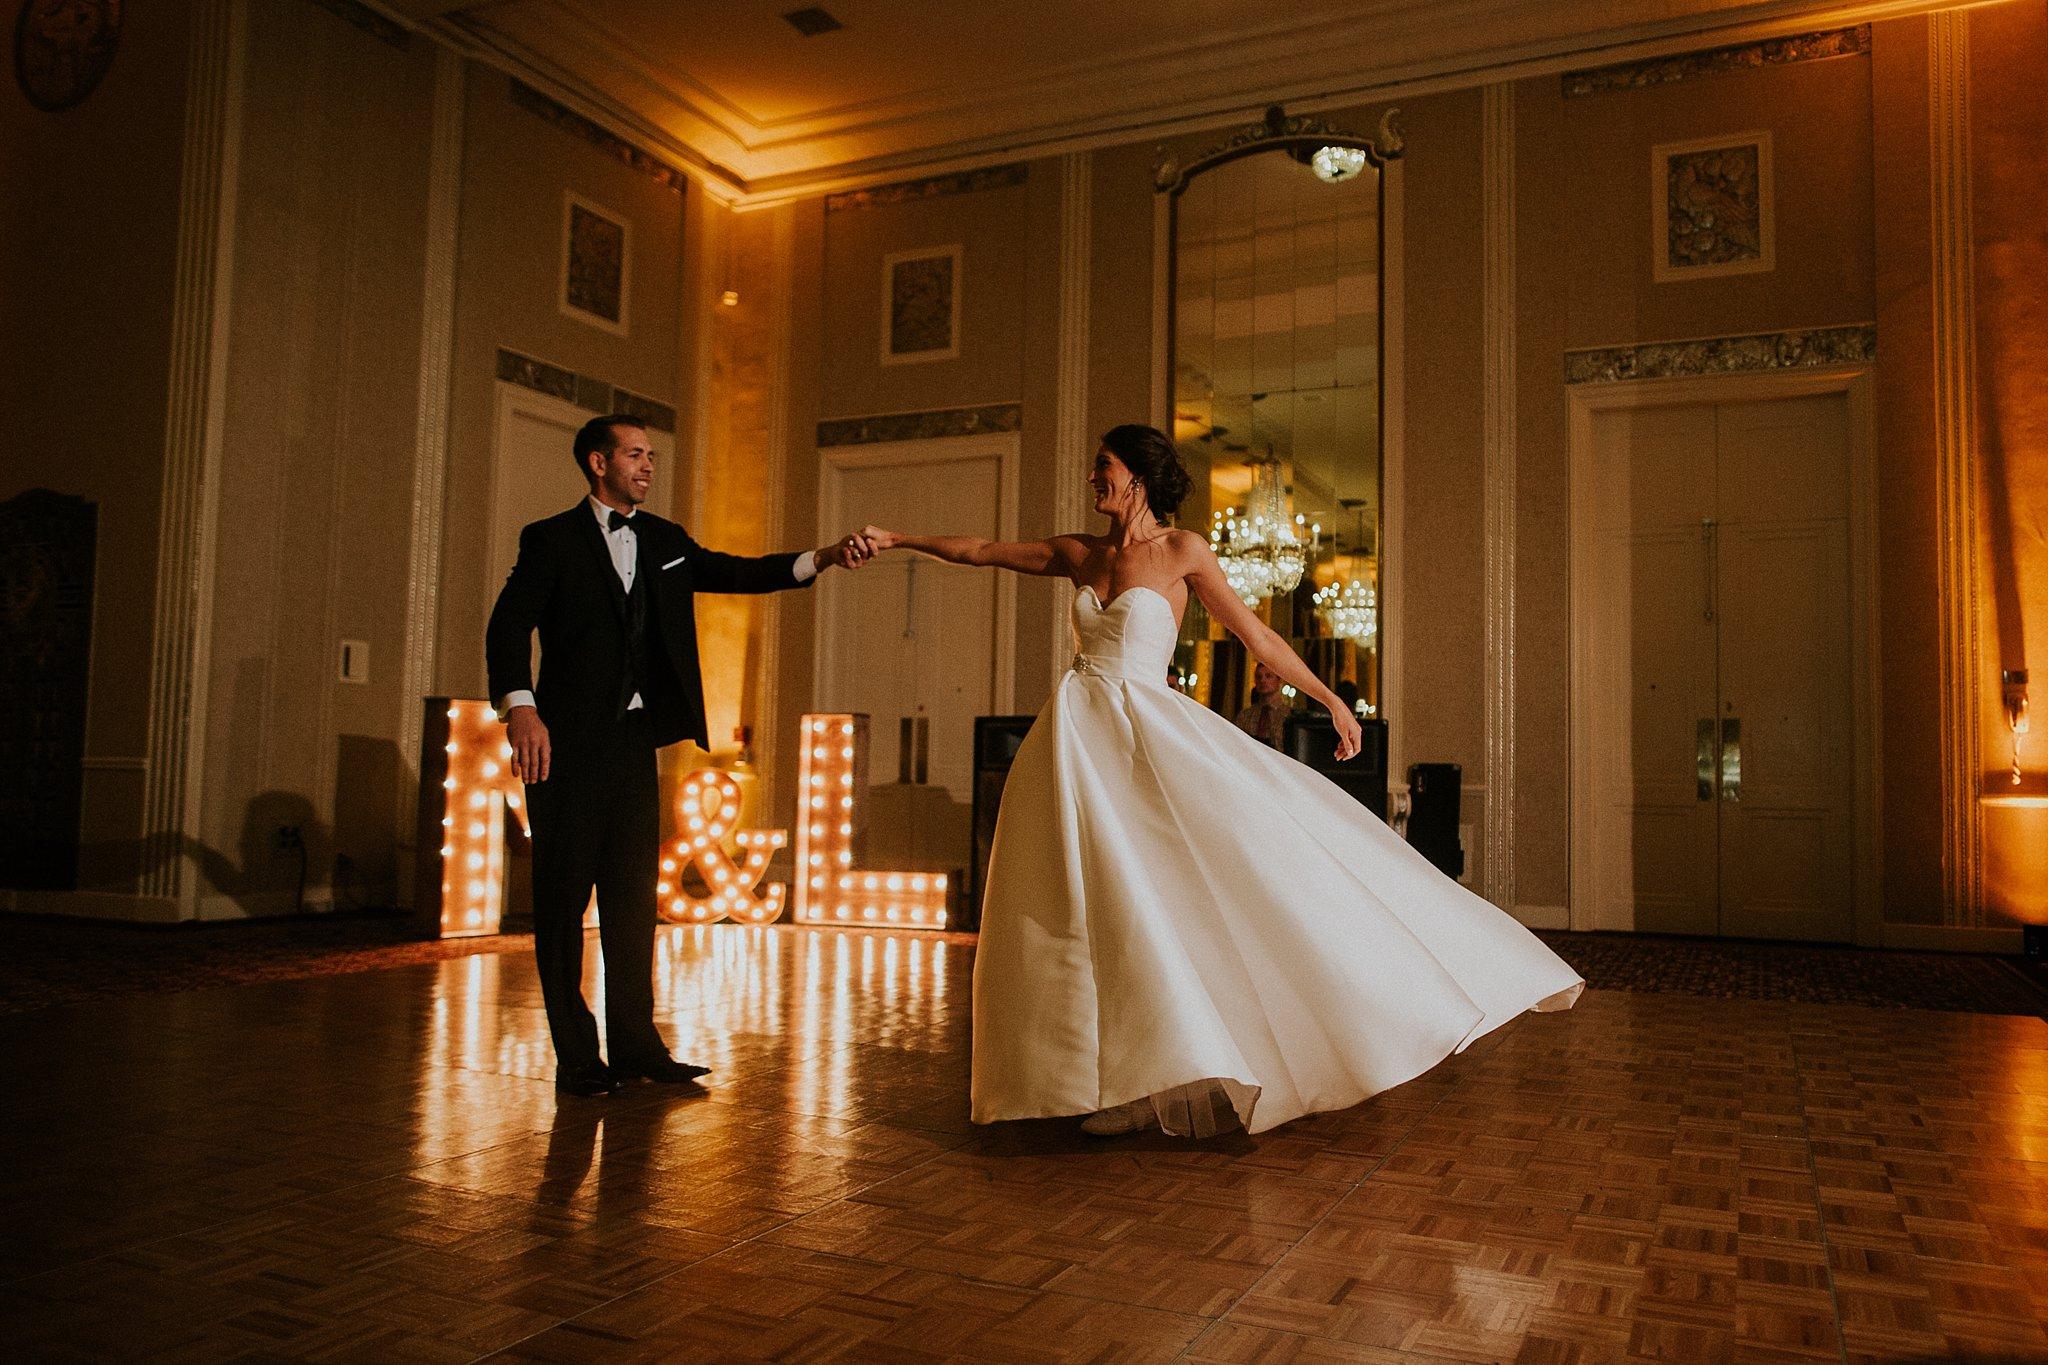 Matt-Lauren_St-Marys_Hilton-City-Center-Milwaukee-Wedding_liller-photo_0087.jpg